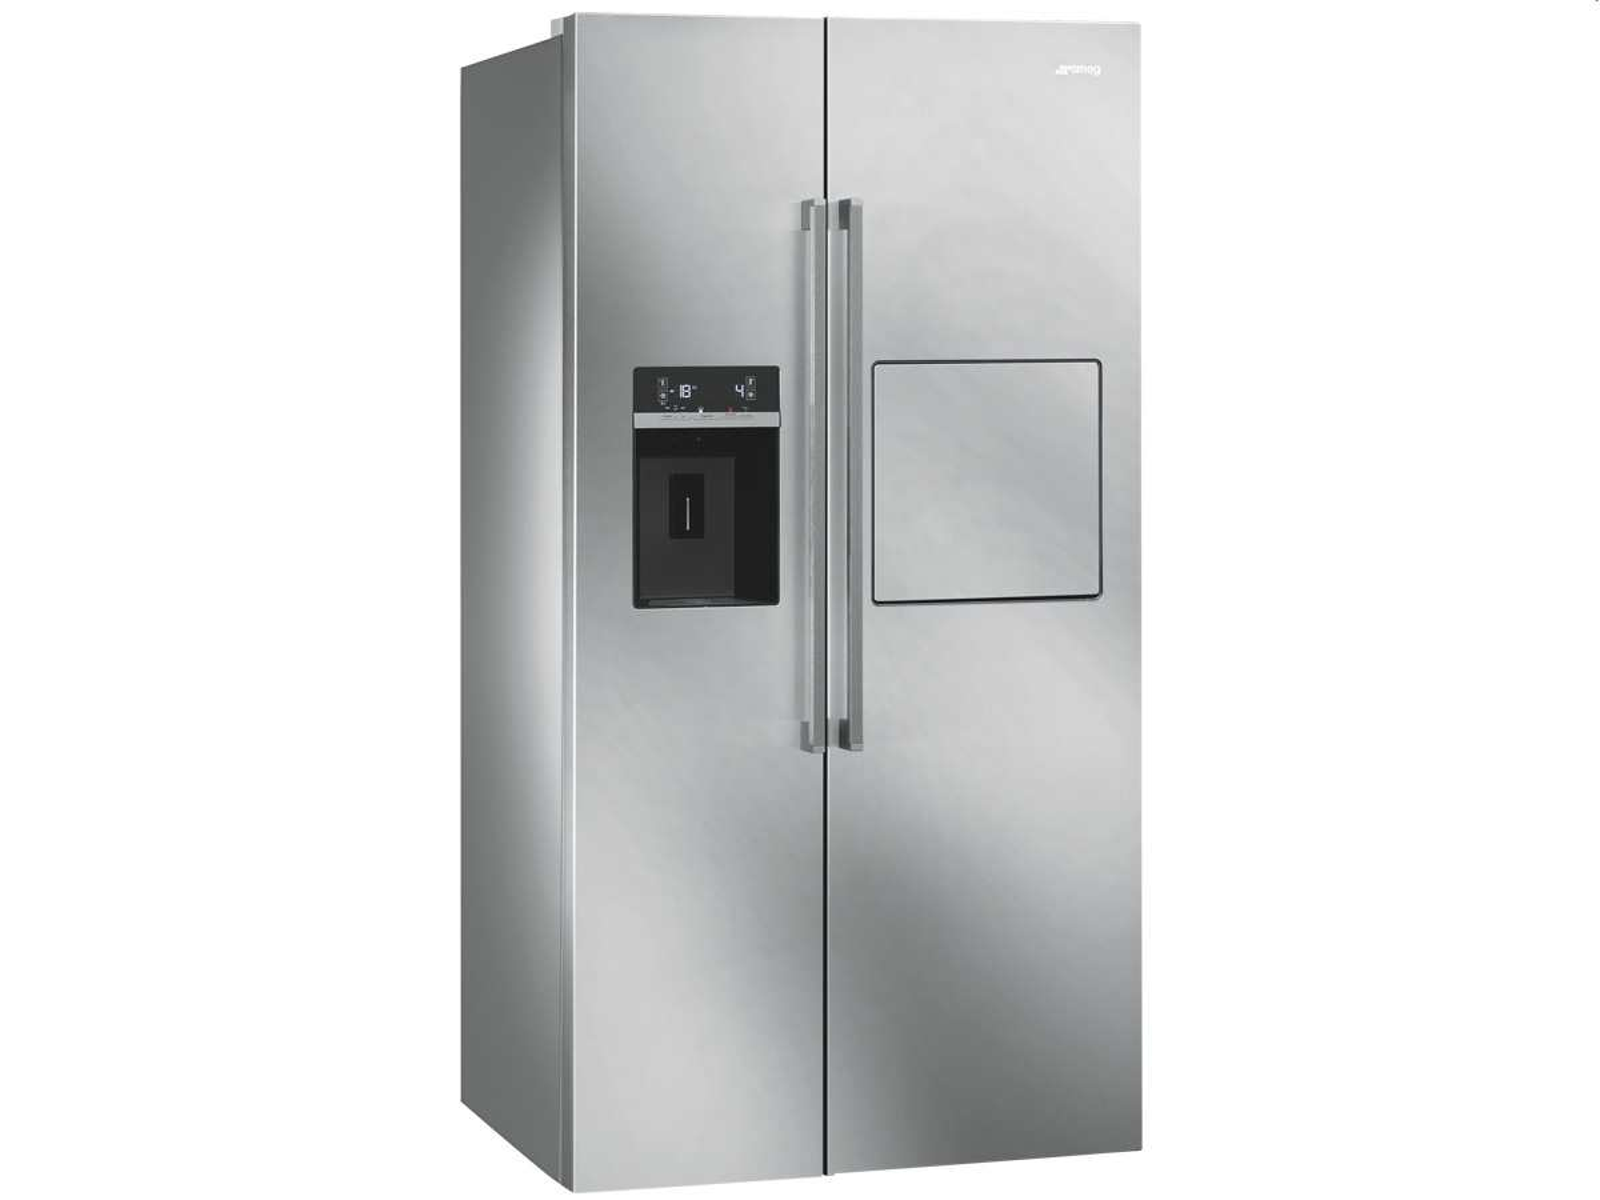 Smeg Kühlschrank Dichtung Austauschen : Ersatzteile kühlschrankdichtung bosch türfach bosch kühl